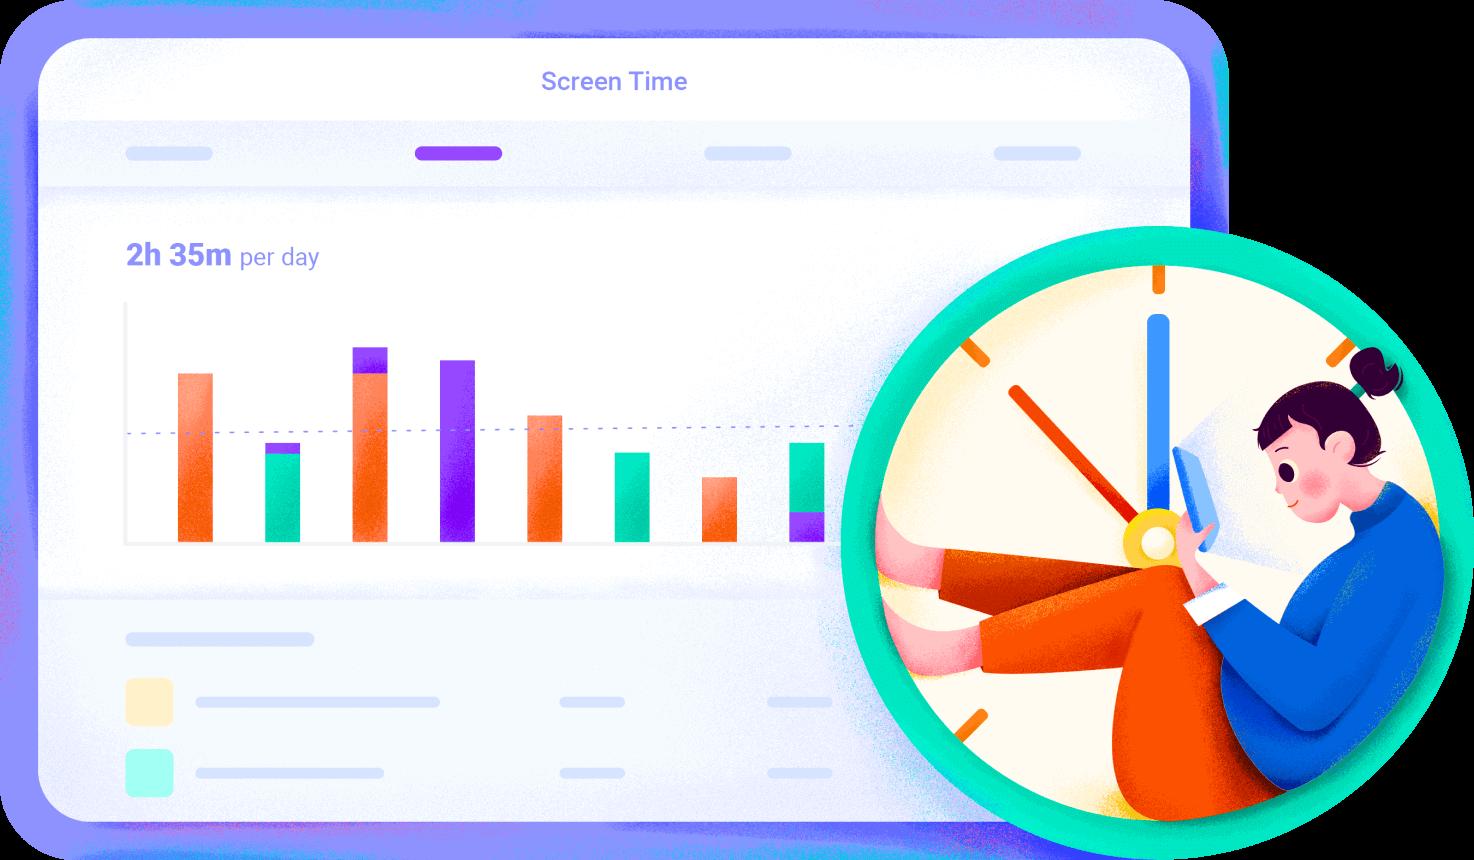 Screen Time app